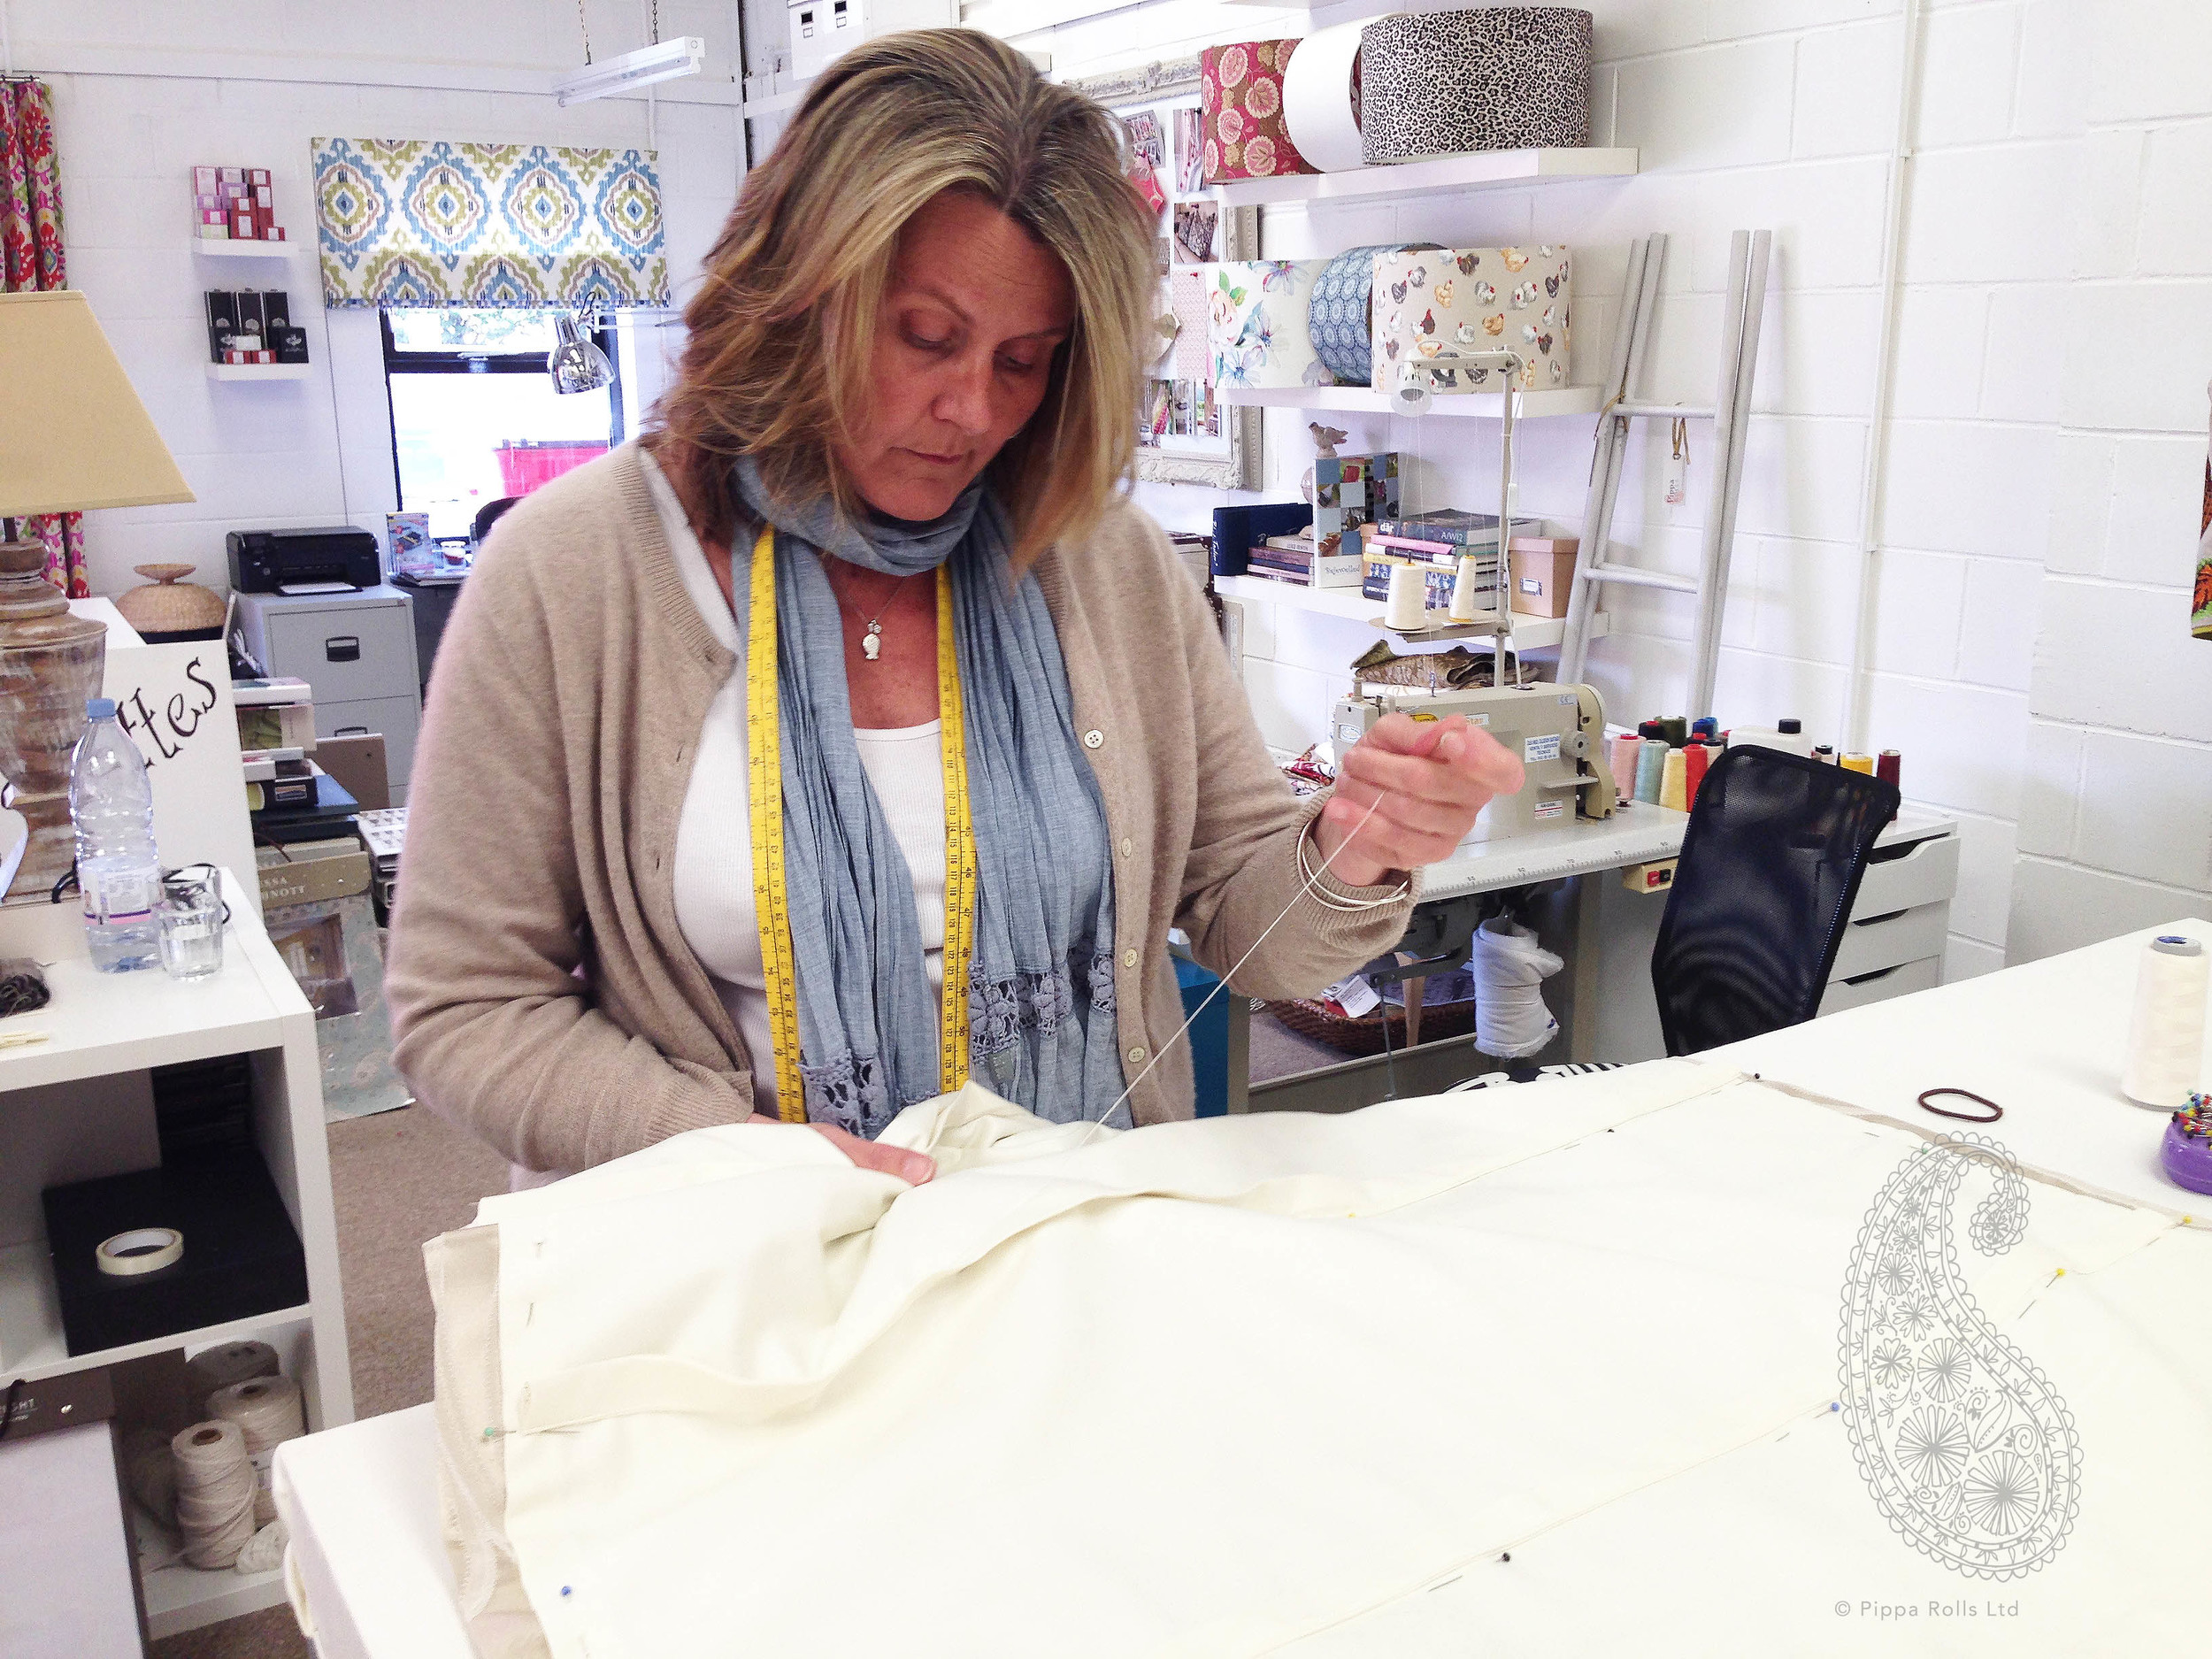 Pippa sewing Pippa Rolls Limited jpeg.jpg